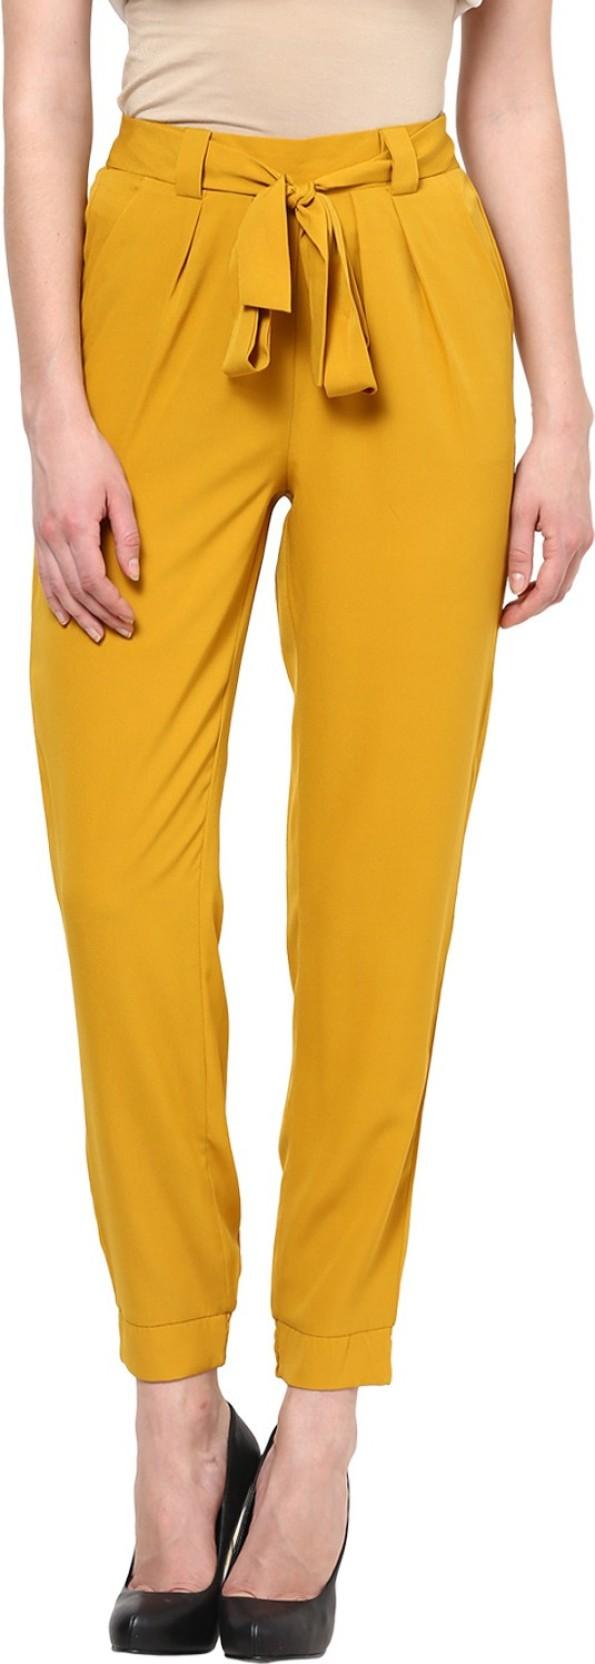 092a72caa002 Mustard Dress Pants